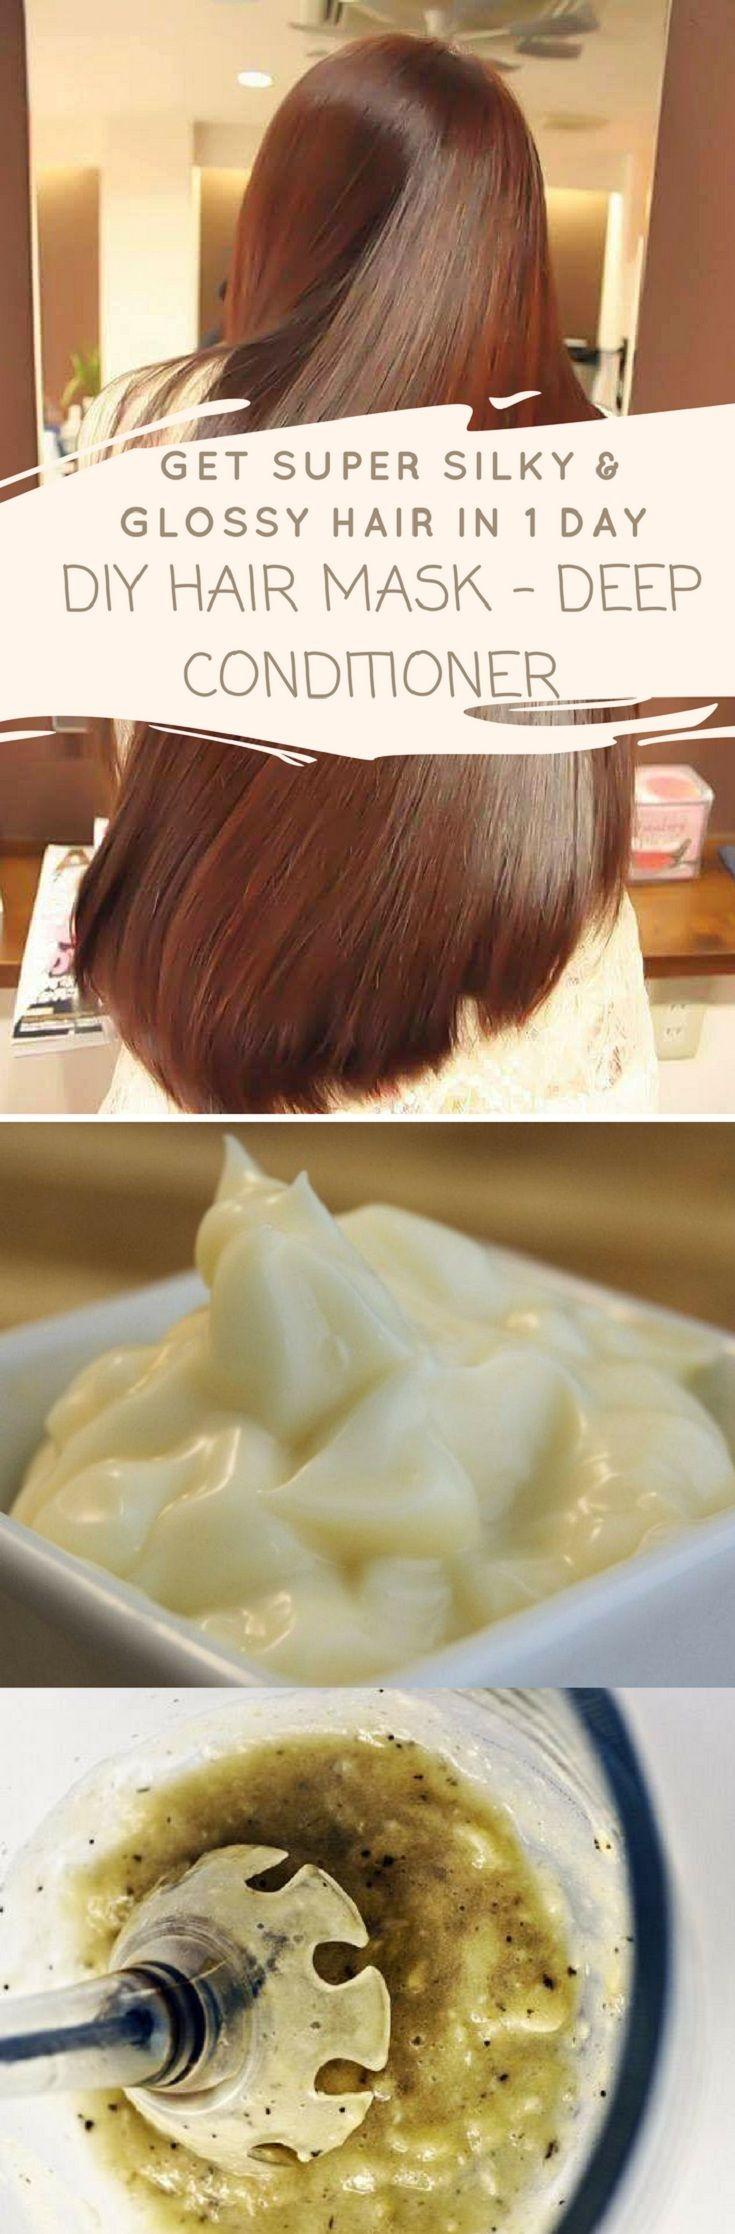 Get super silky & glossy hair in 1 day | DIY Hair Mask – Deep Conditioner #silky #glossy #hair #diy #mask #conditioner #health